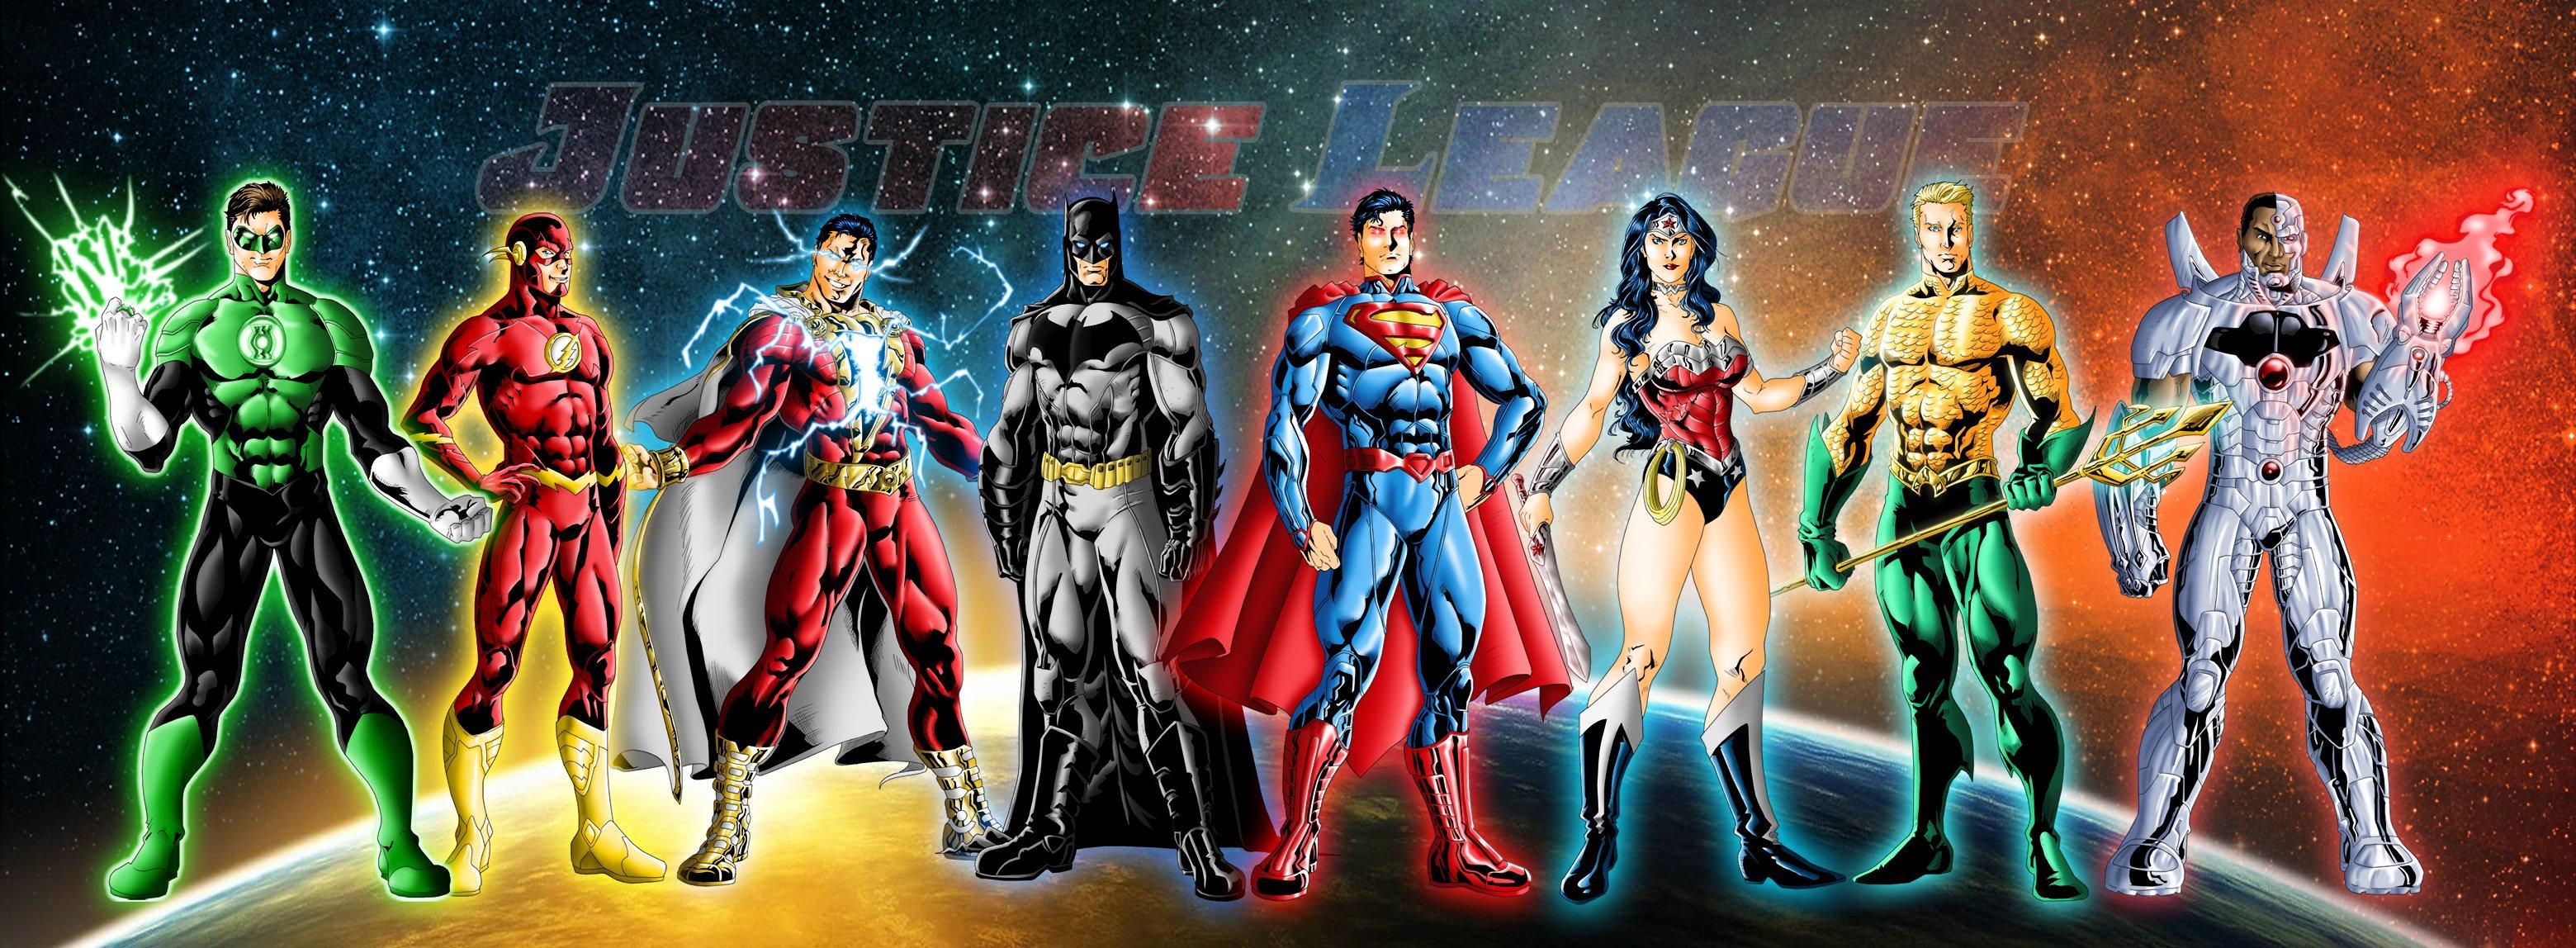 49 Justice League New 52 Wallpaper On Wallpapersafari